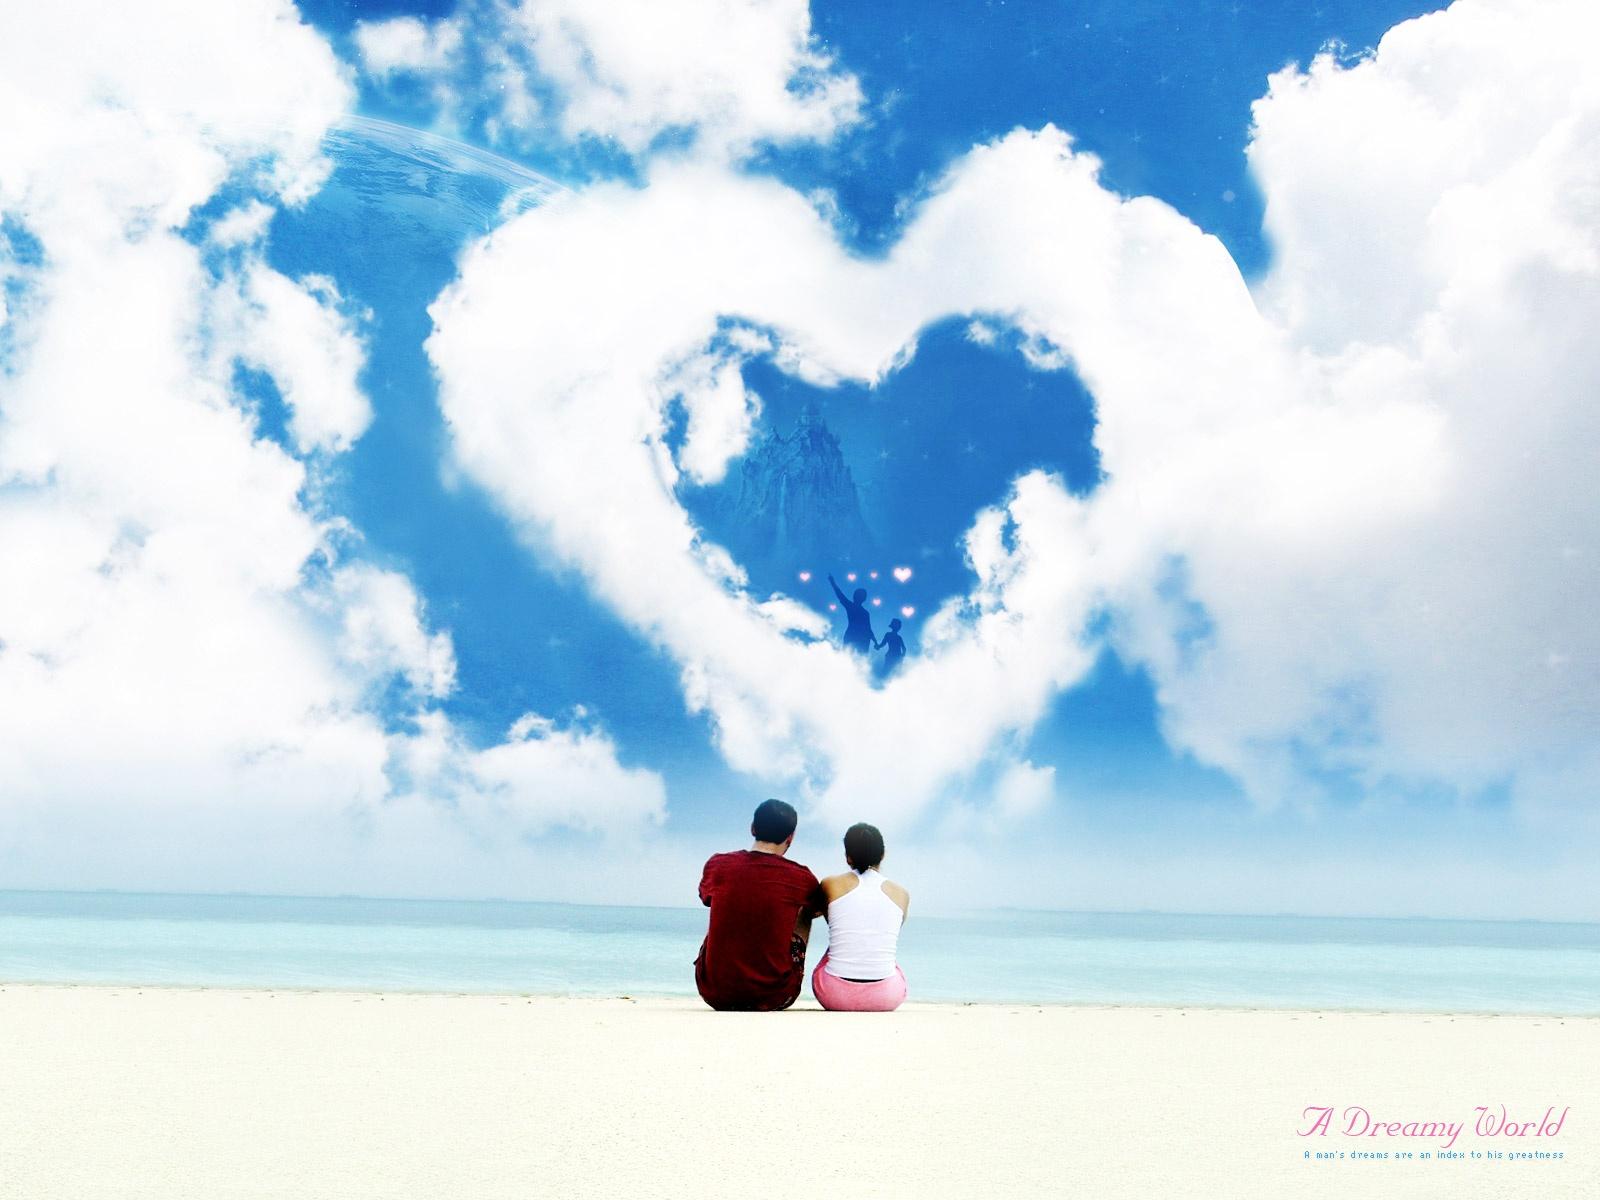 Wallpaper download of love - Wallpaper Download Of Love Dreamy Love World Download